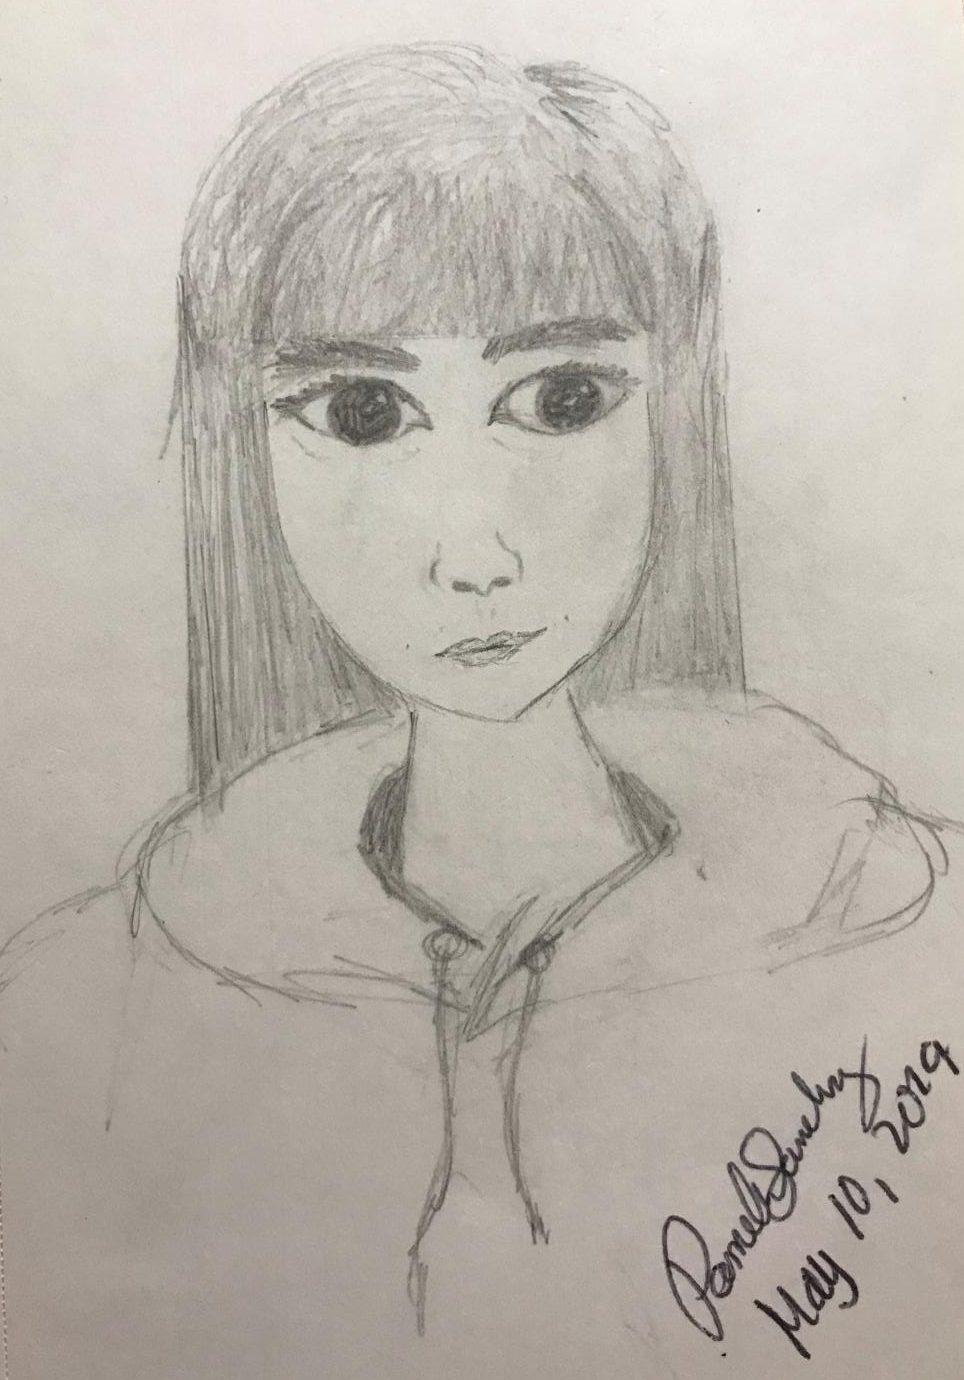 Drawing by Pamela Sanchez